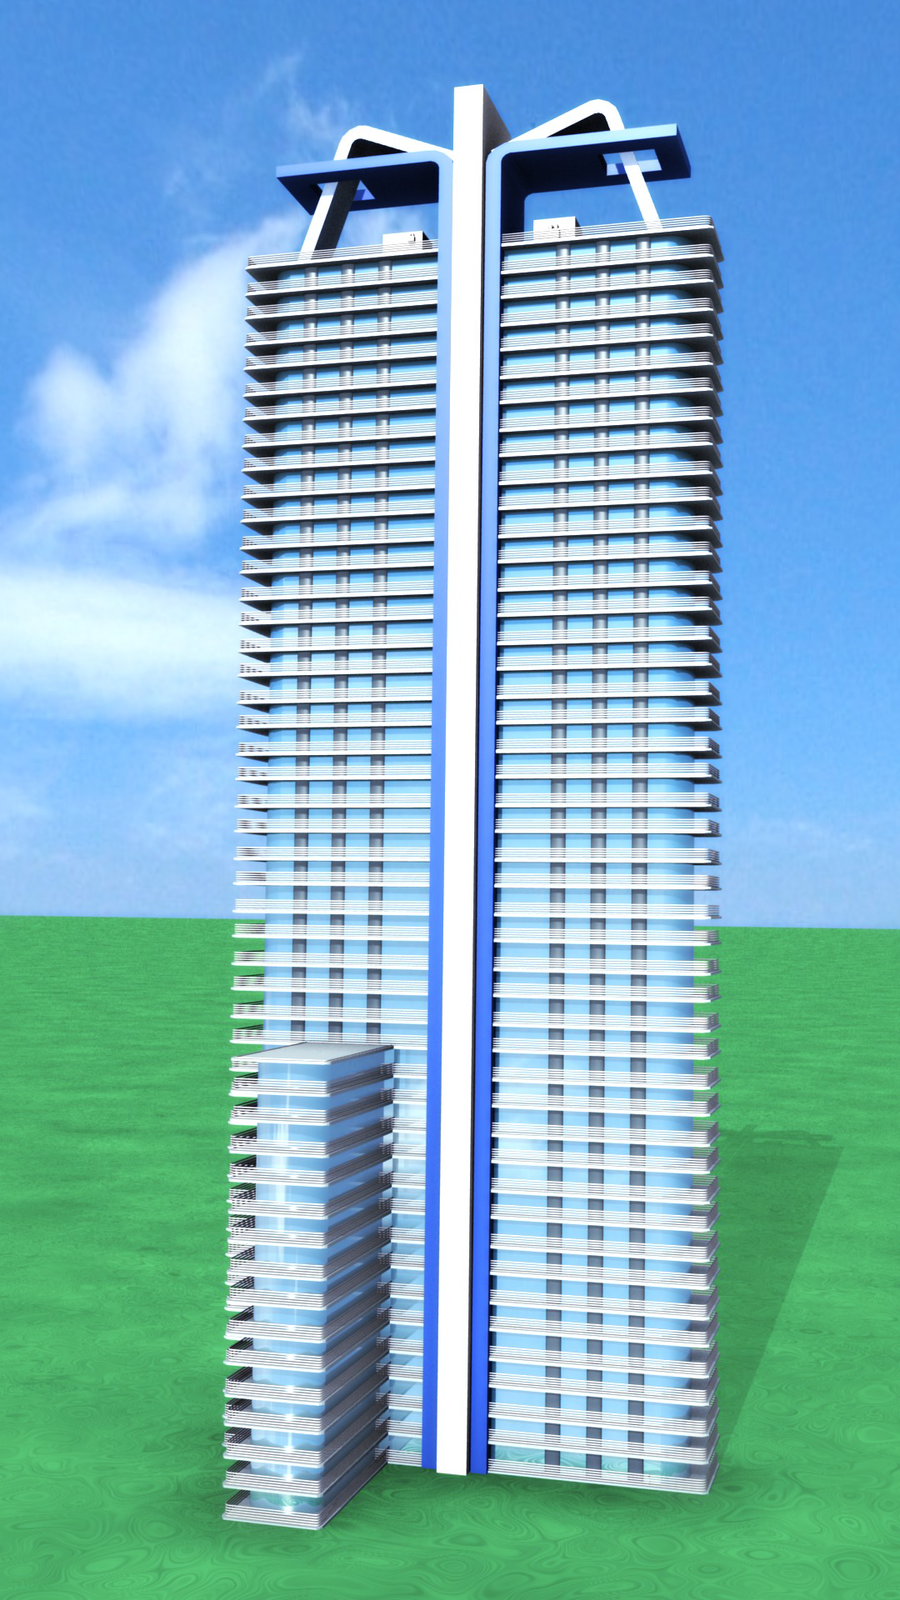 3d skyscraper wip by gookins on deviantart. Black Bedroom Furniture Sets. Home Design Ideas